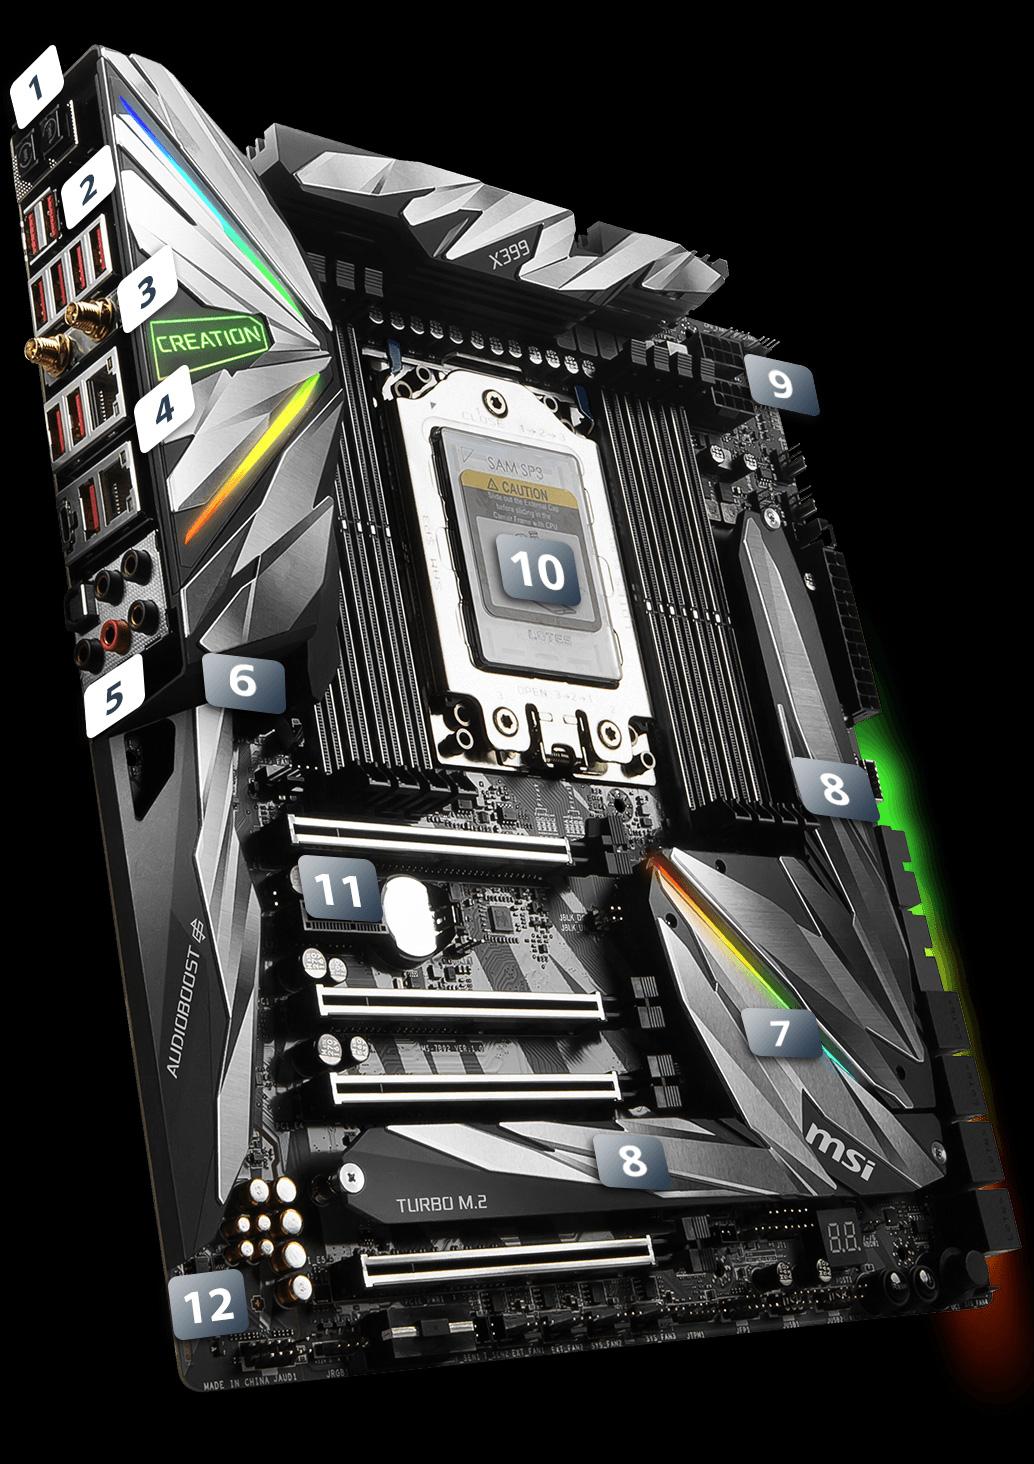 Amd Amplified Muscle Definition: MSI MEG X399 CREATION STR4 AMD X399 SATA 6Gb/s USB 3.1